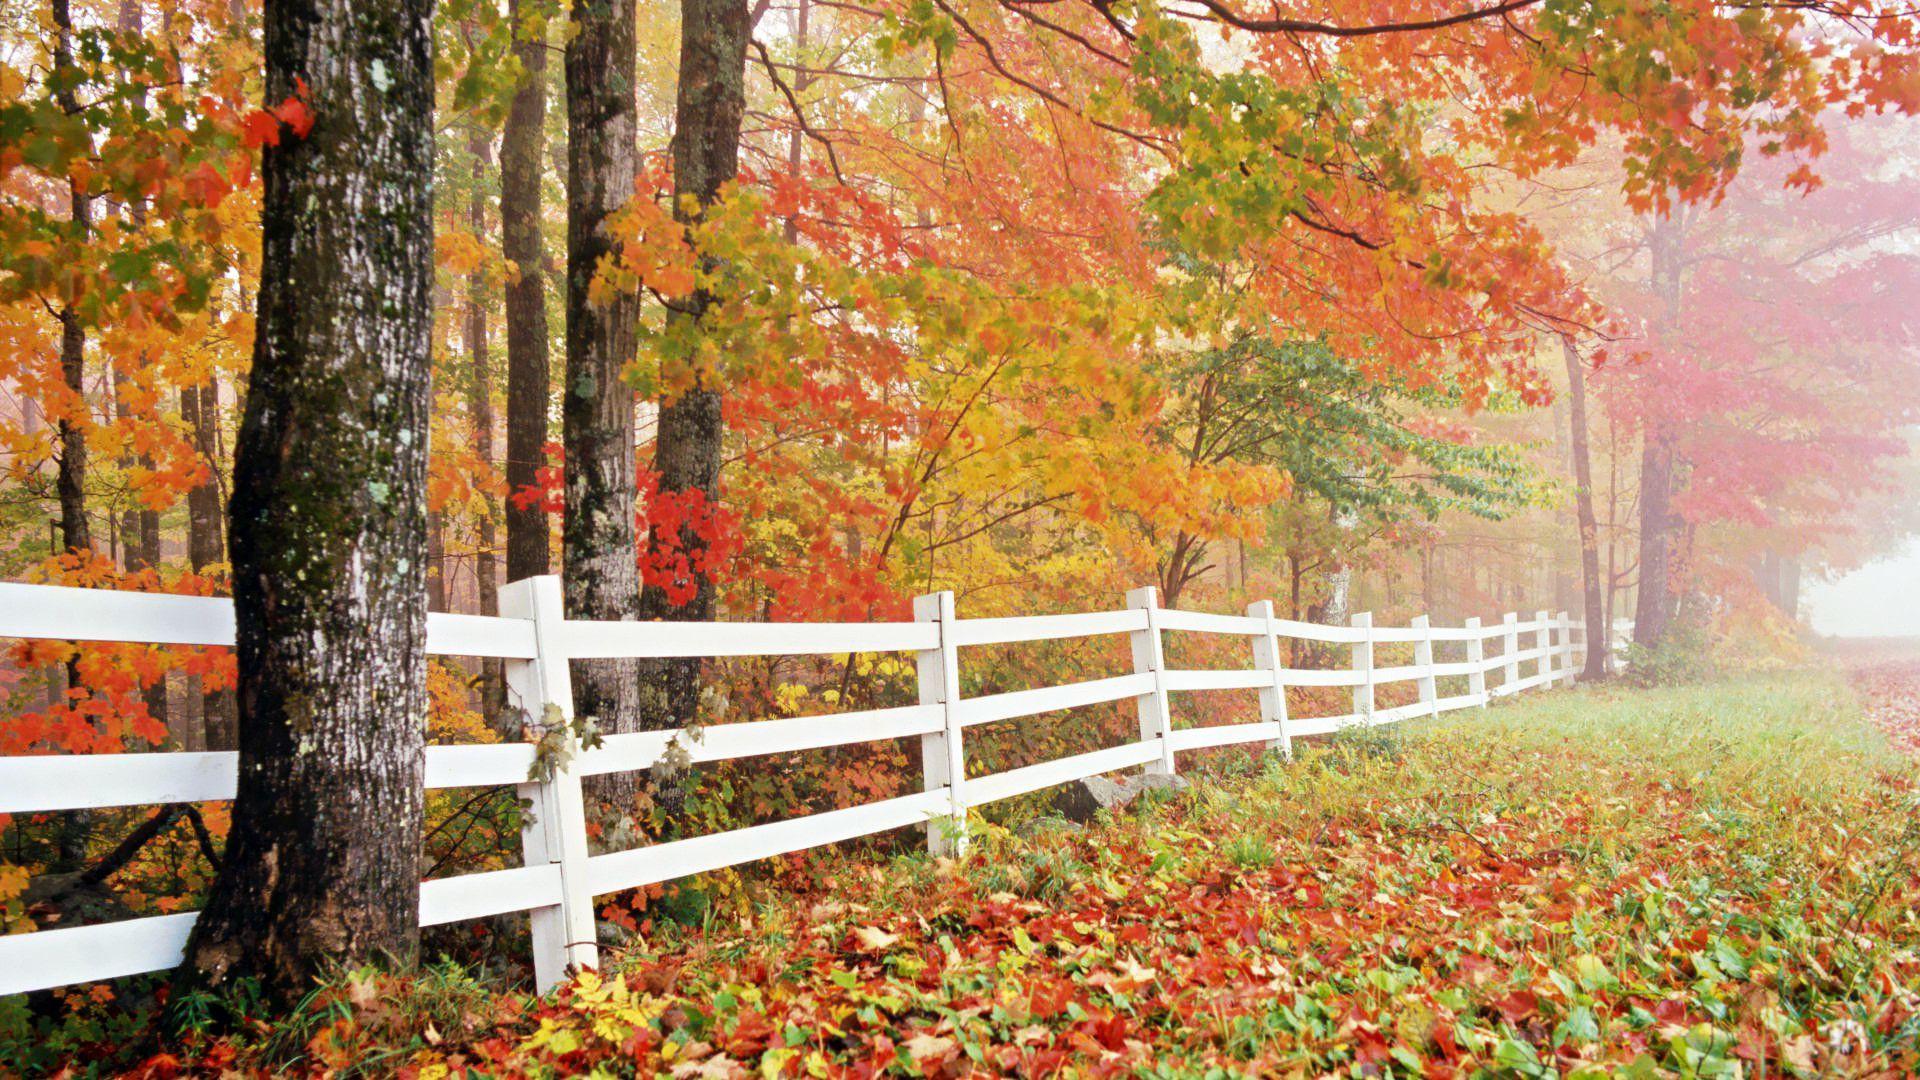 Nature Wallpaper Autumn Download Hd Computer Hd Wallpapers 1080p Download Full Hd Wallpaper New Nature Wallpaper Nature Wallpaper Watercolor Wallpaper Iphone